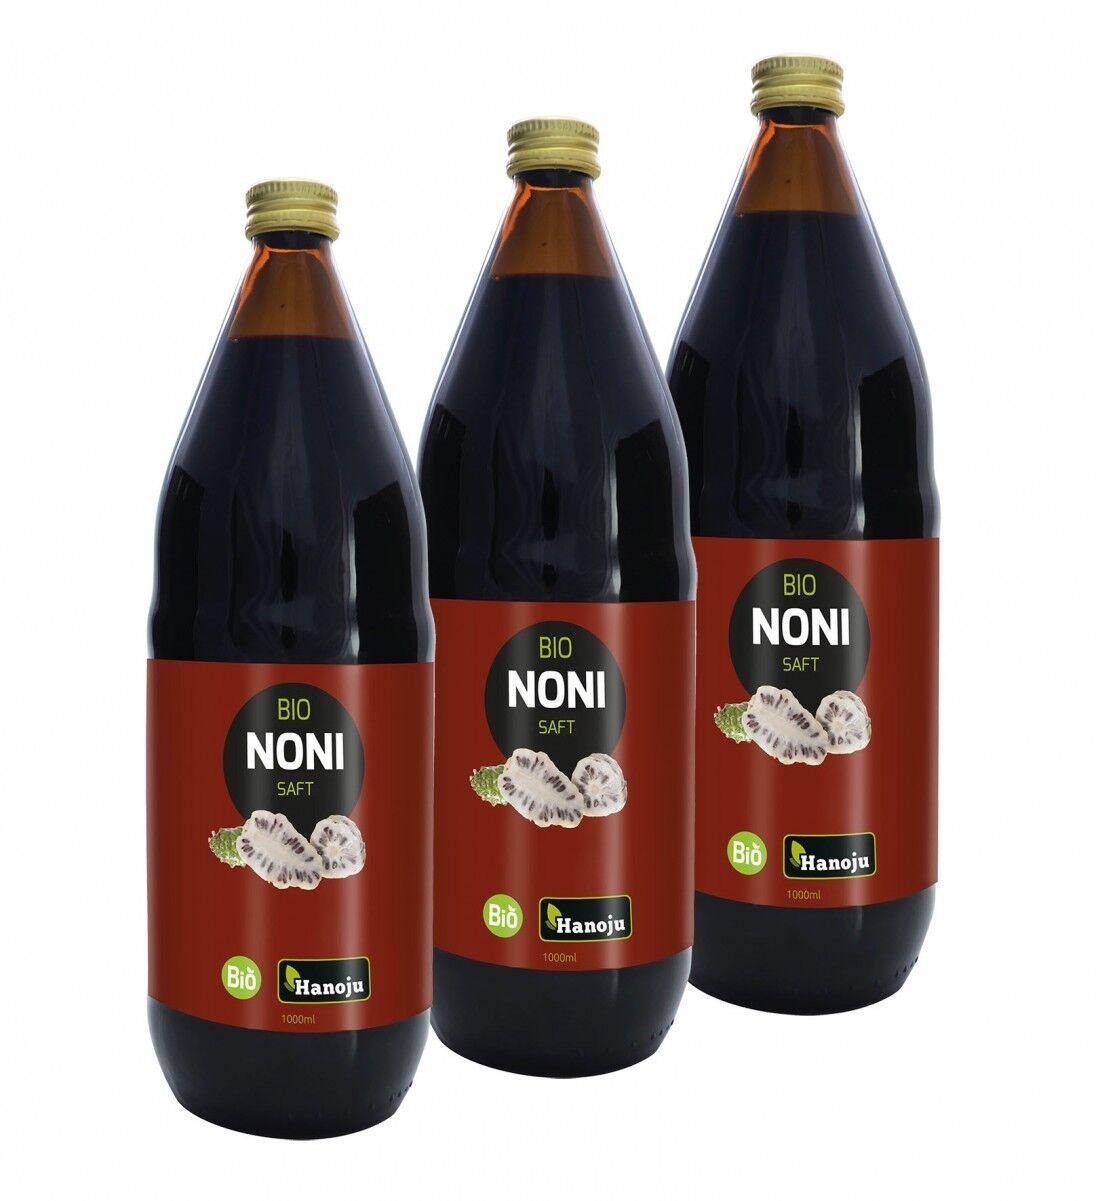 Hanoju Bio Noni Saft,  3 x 1000 ml (17,98€/1l)